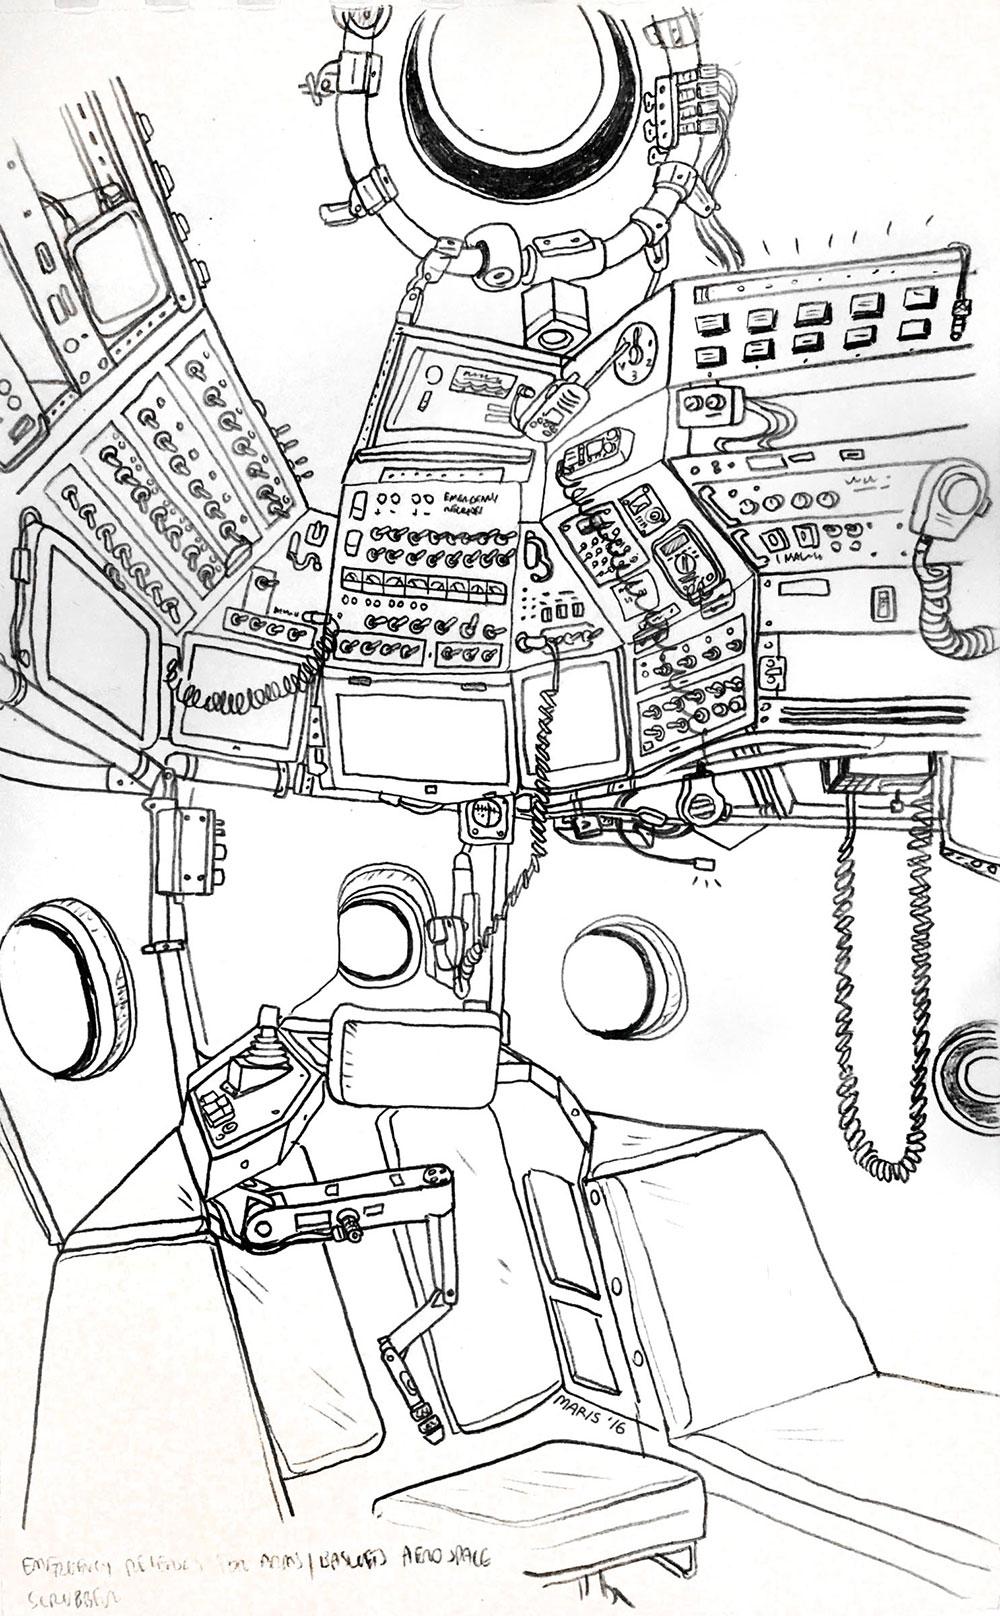 04_inside_alvin_sketch-1000